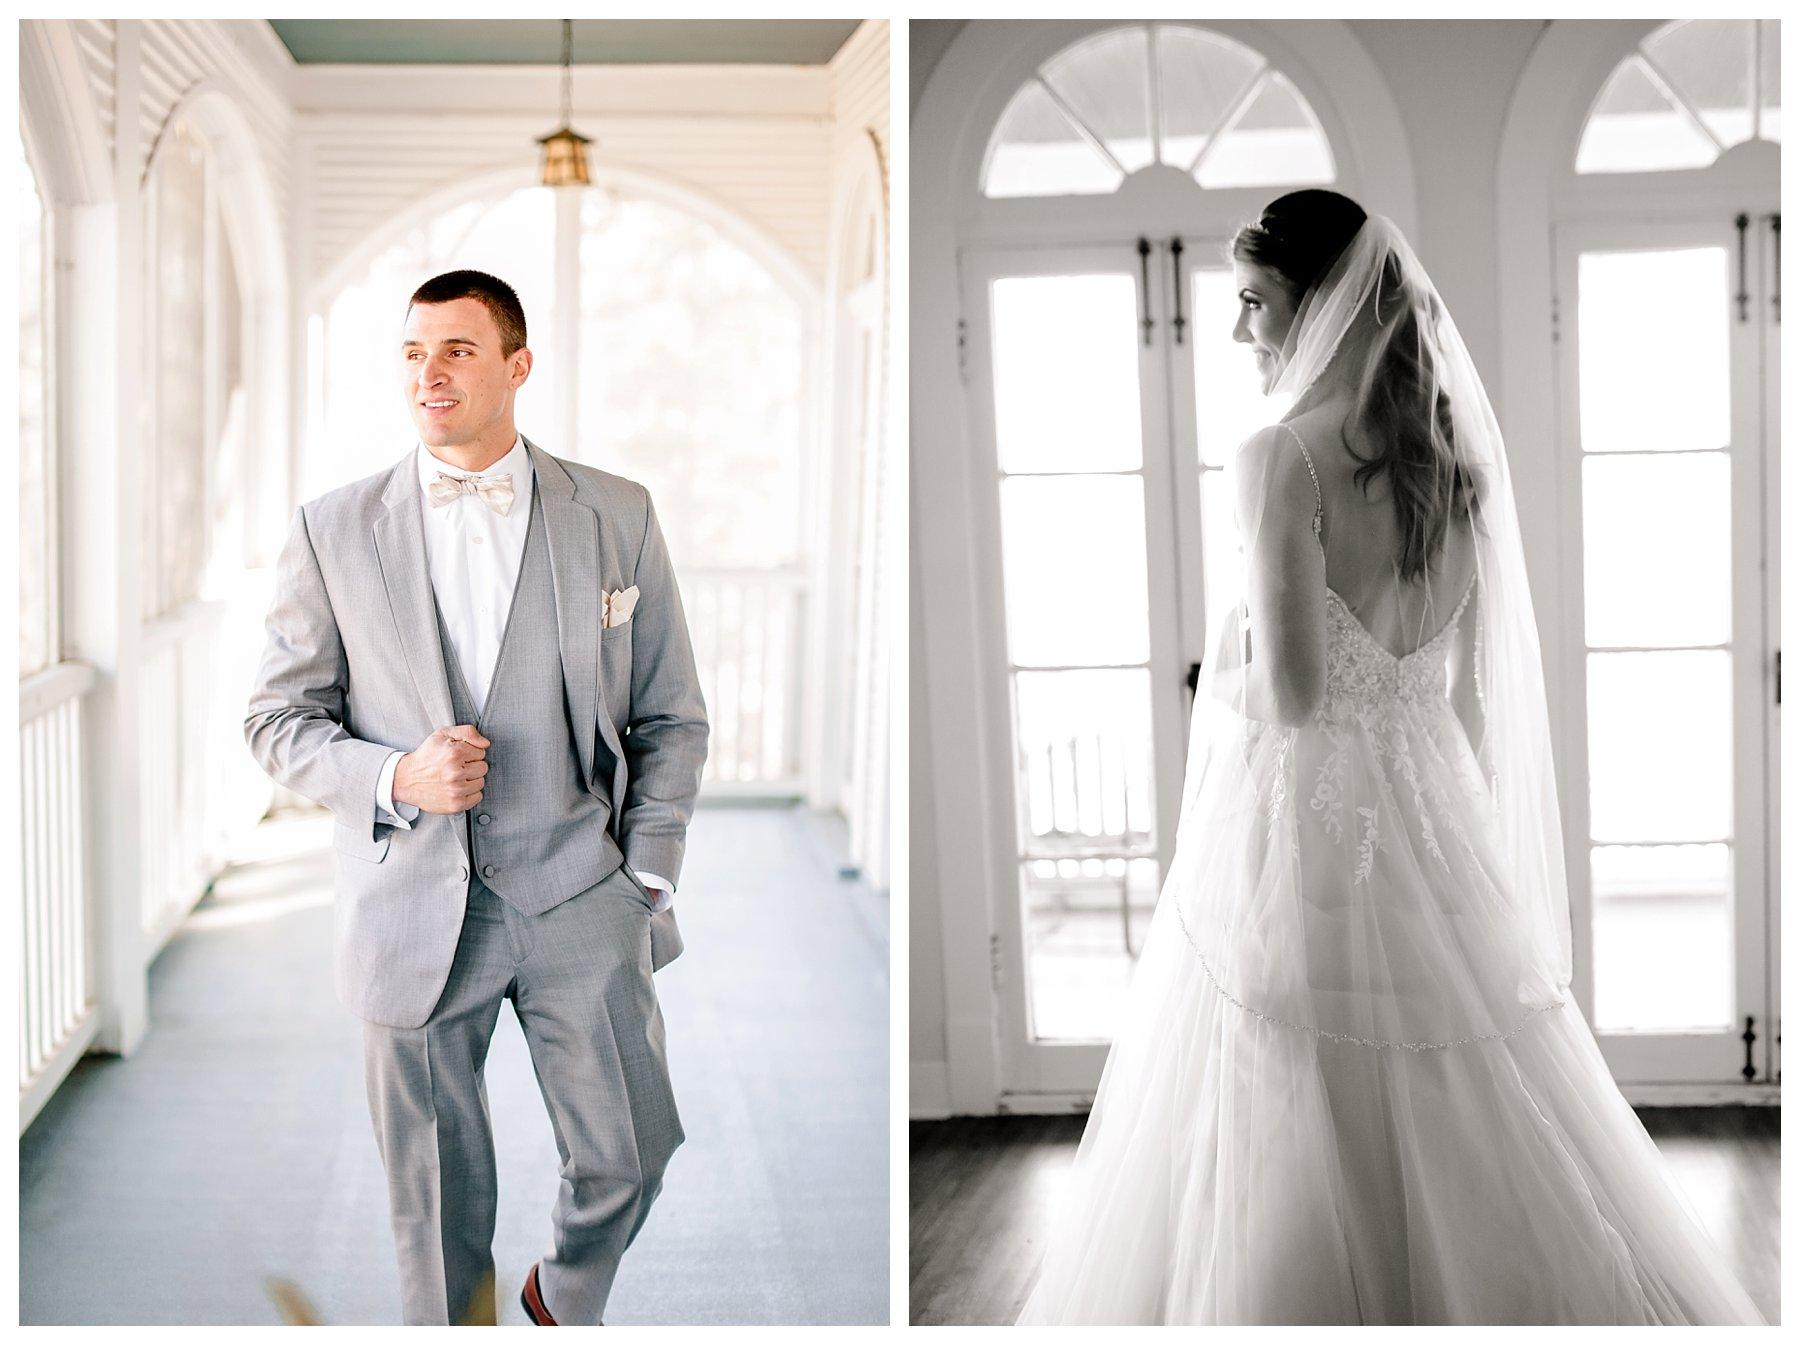 photographer_wedding_saint_louis_Kansas_City_Photography_Videography_workshop_training_styled_engagement_Lake_Ozark_KC_MO_STL_Rolla_Hermann_Saint_James_0355.jpg